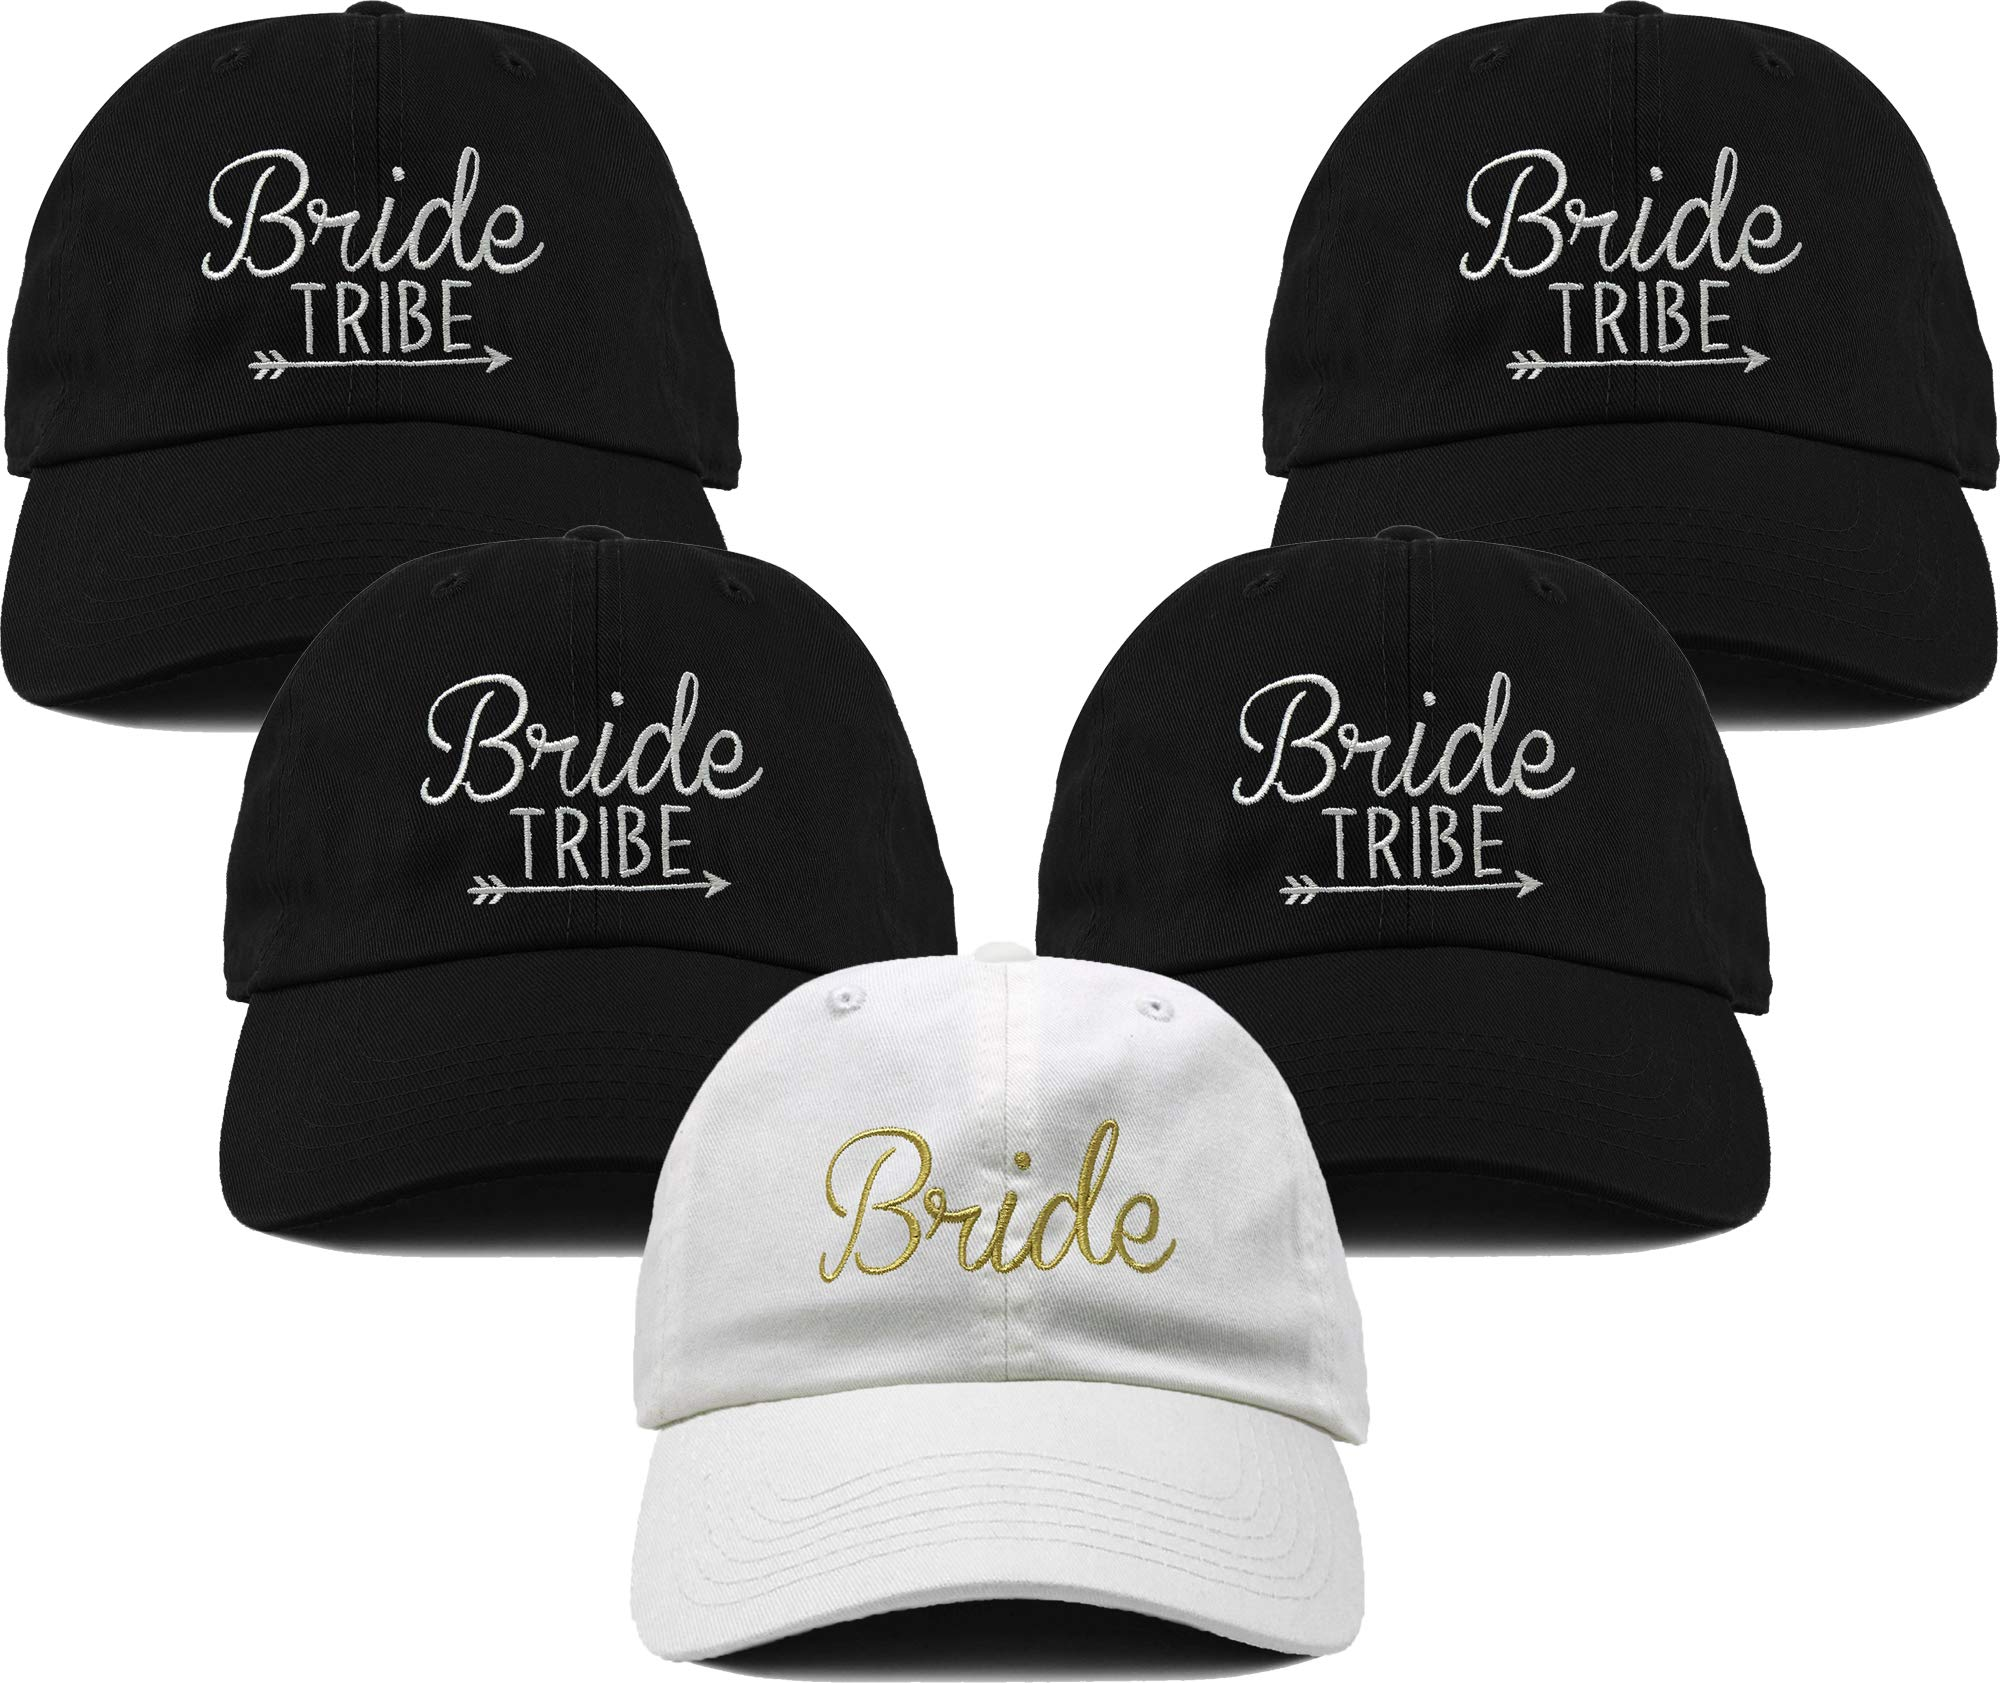 H-214-5-BWG.4BT Dad Hat Bridal Bundle Unconstructed Baseball Cap Bride & 4 Tribe